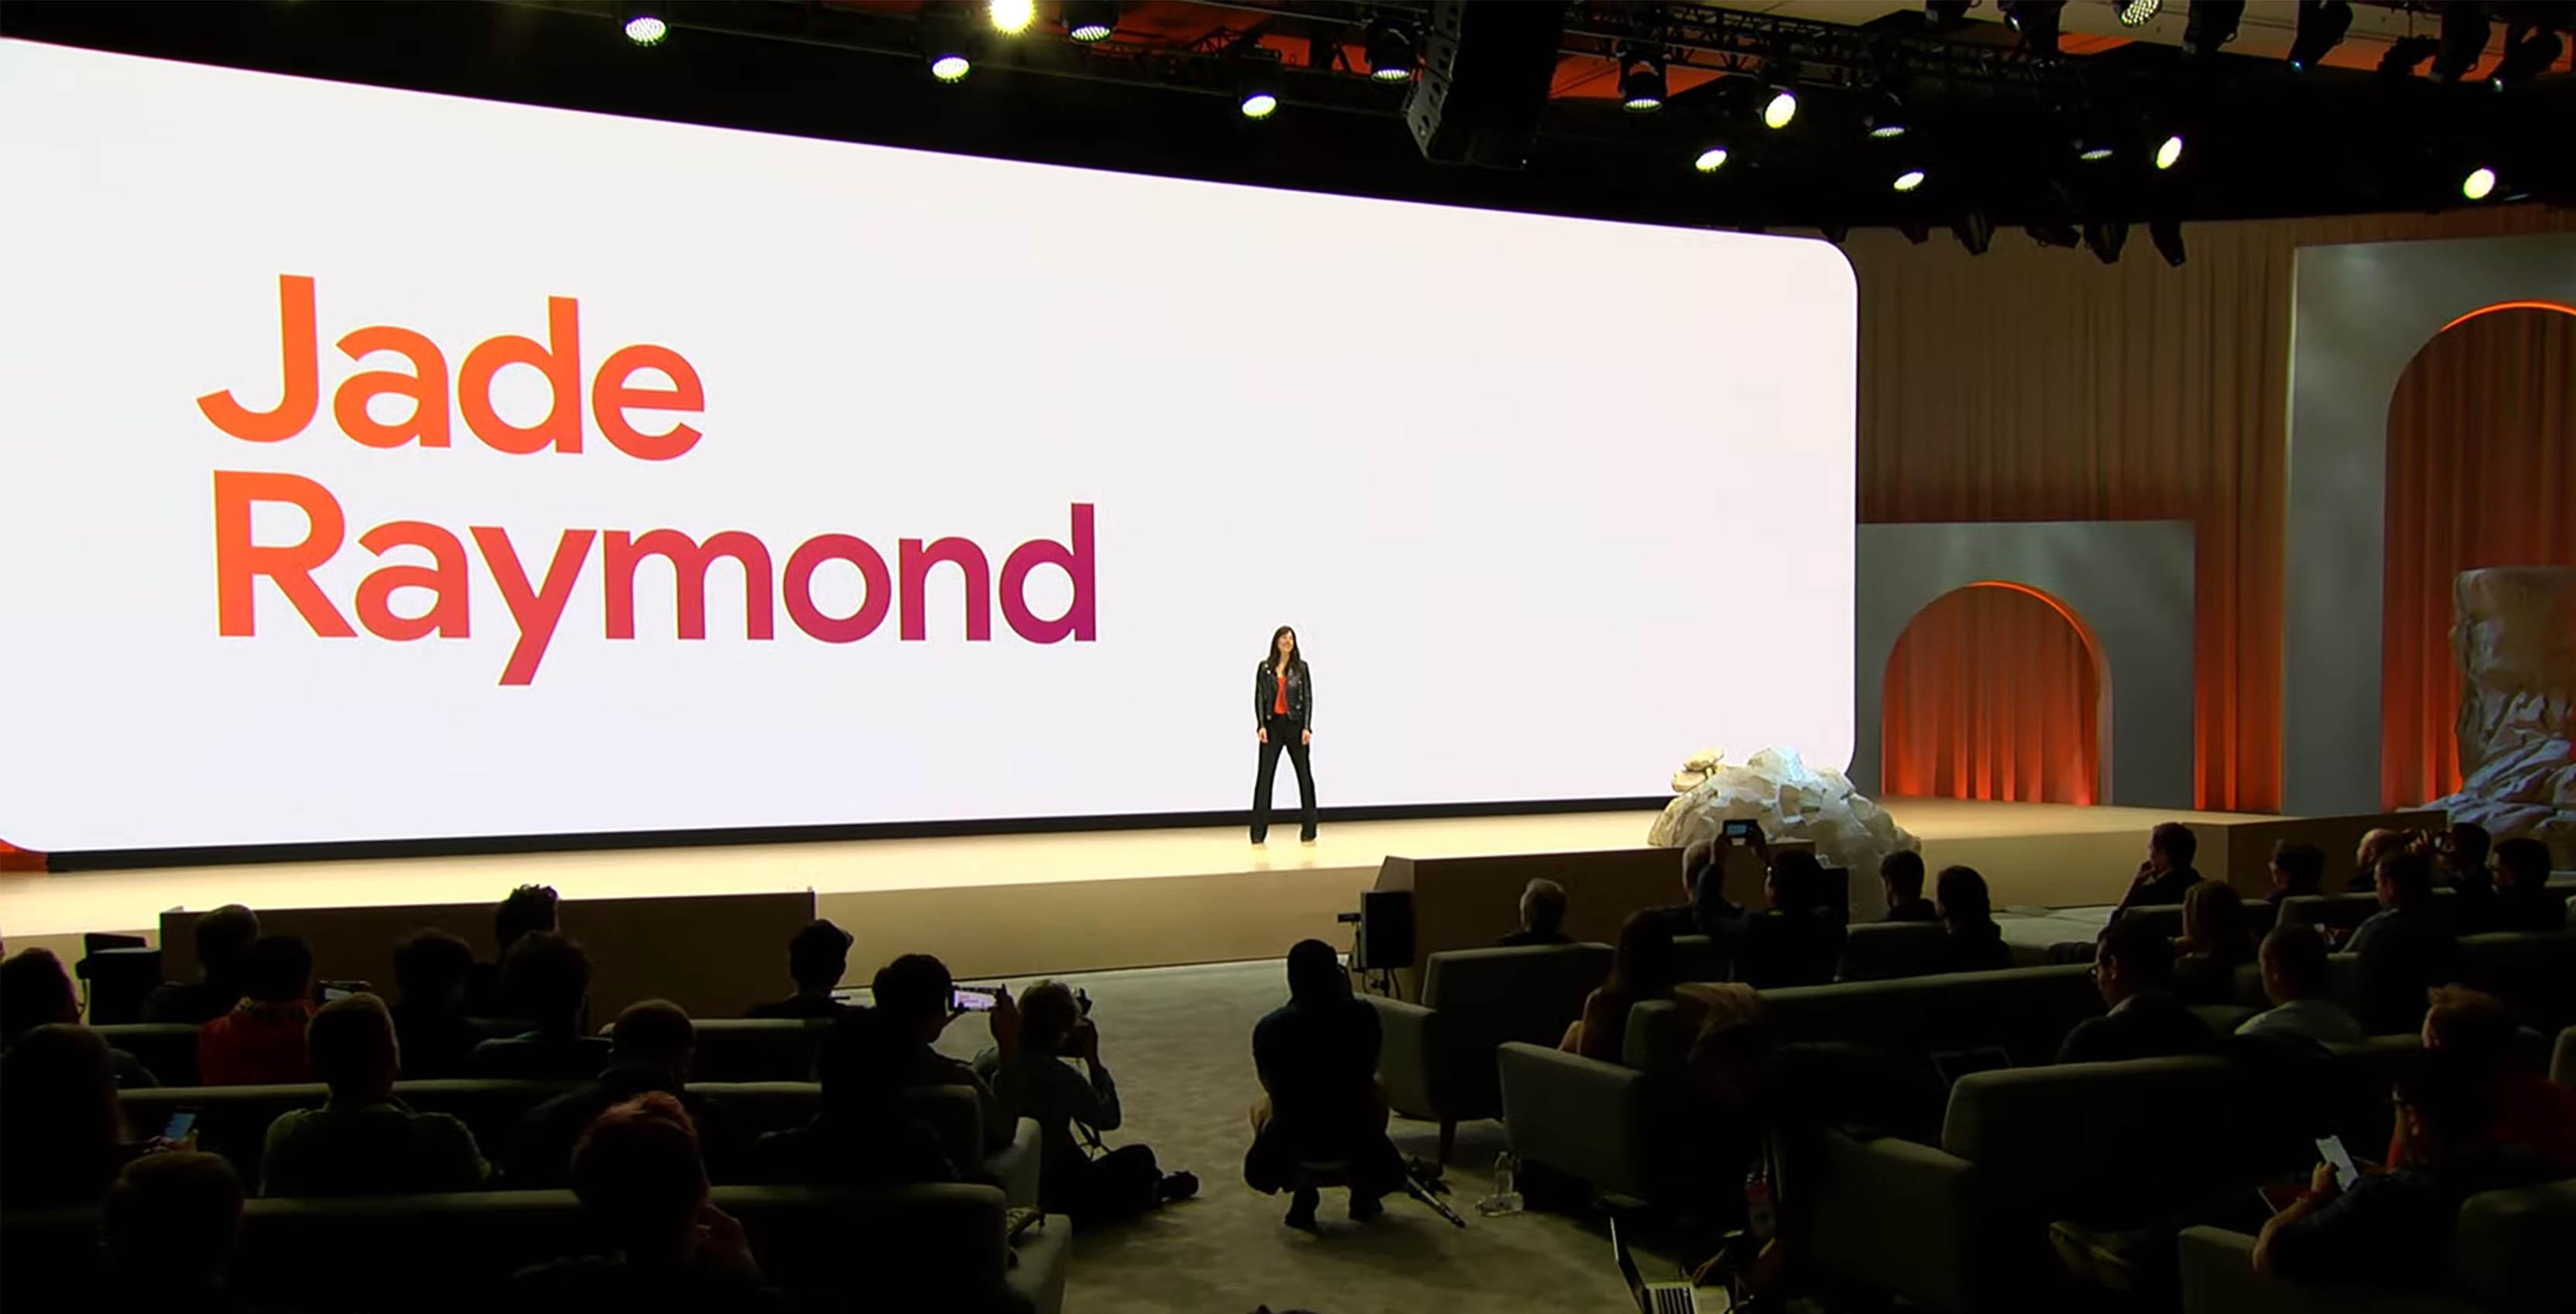 Jade Raymond